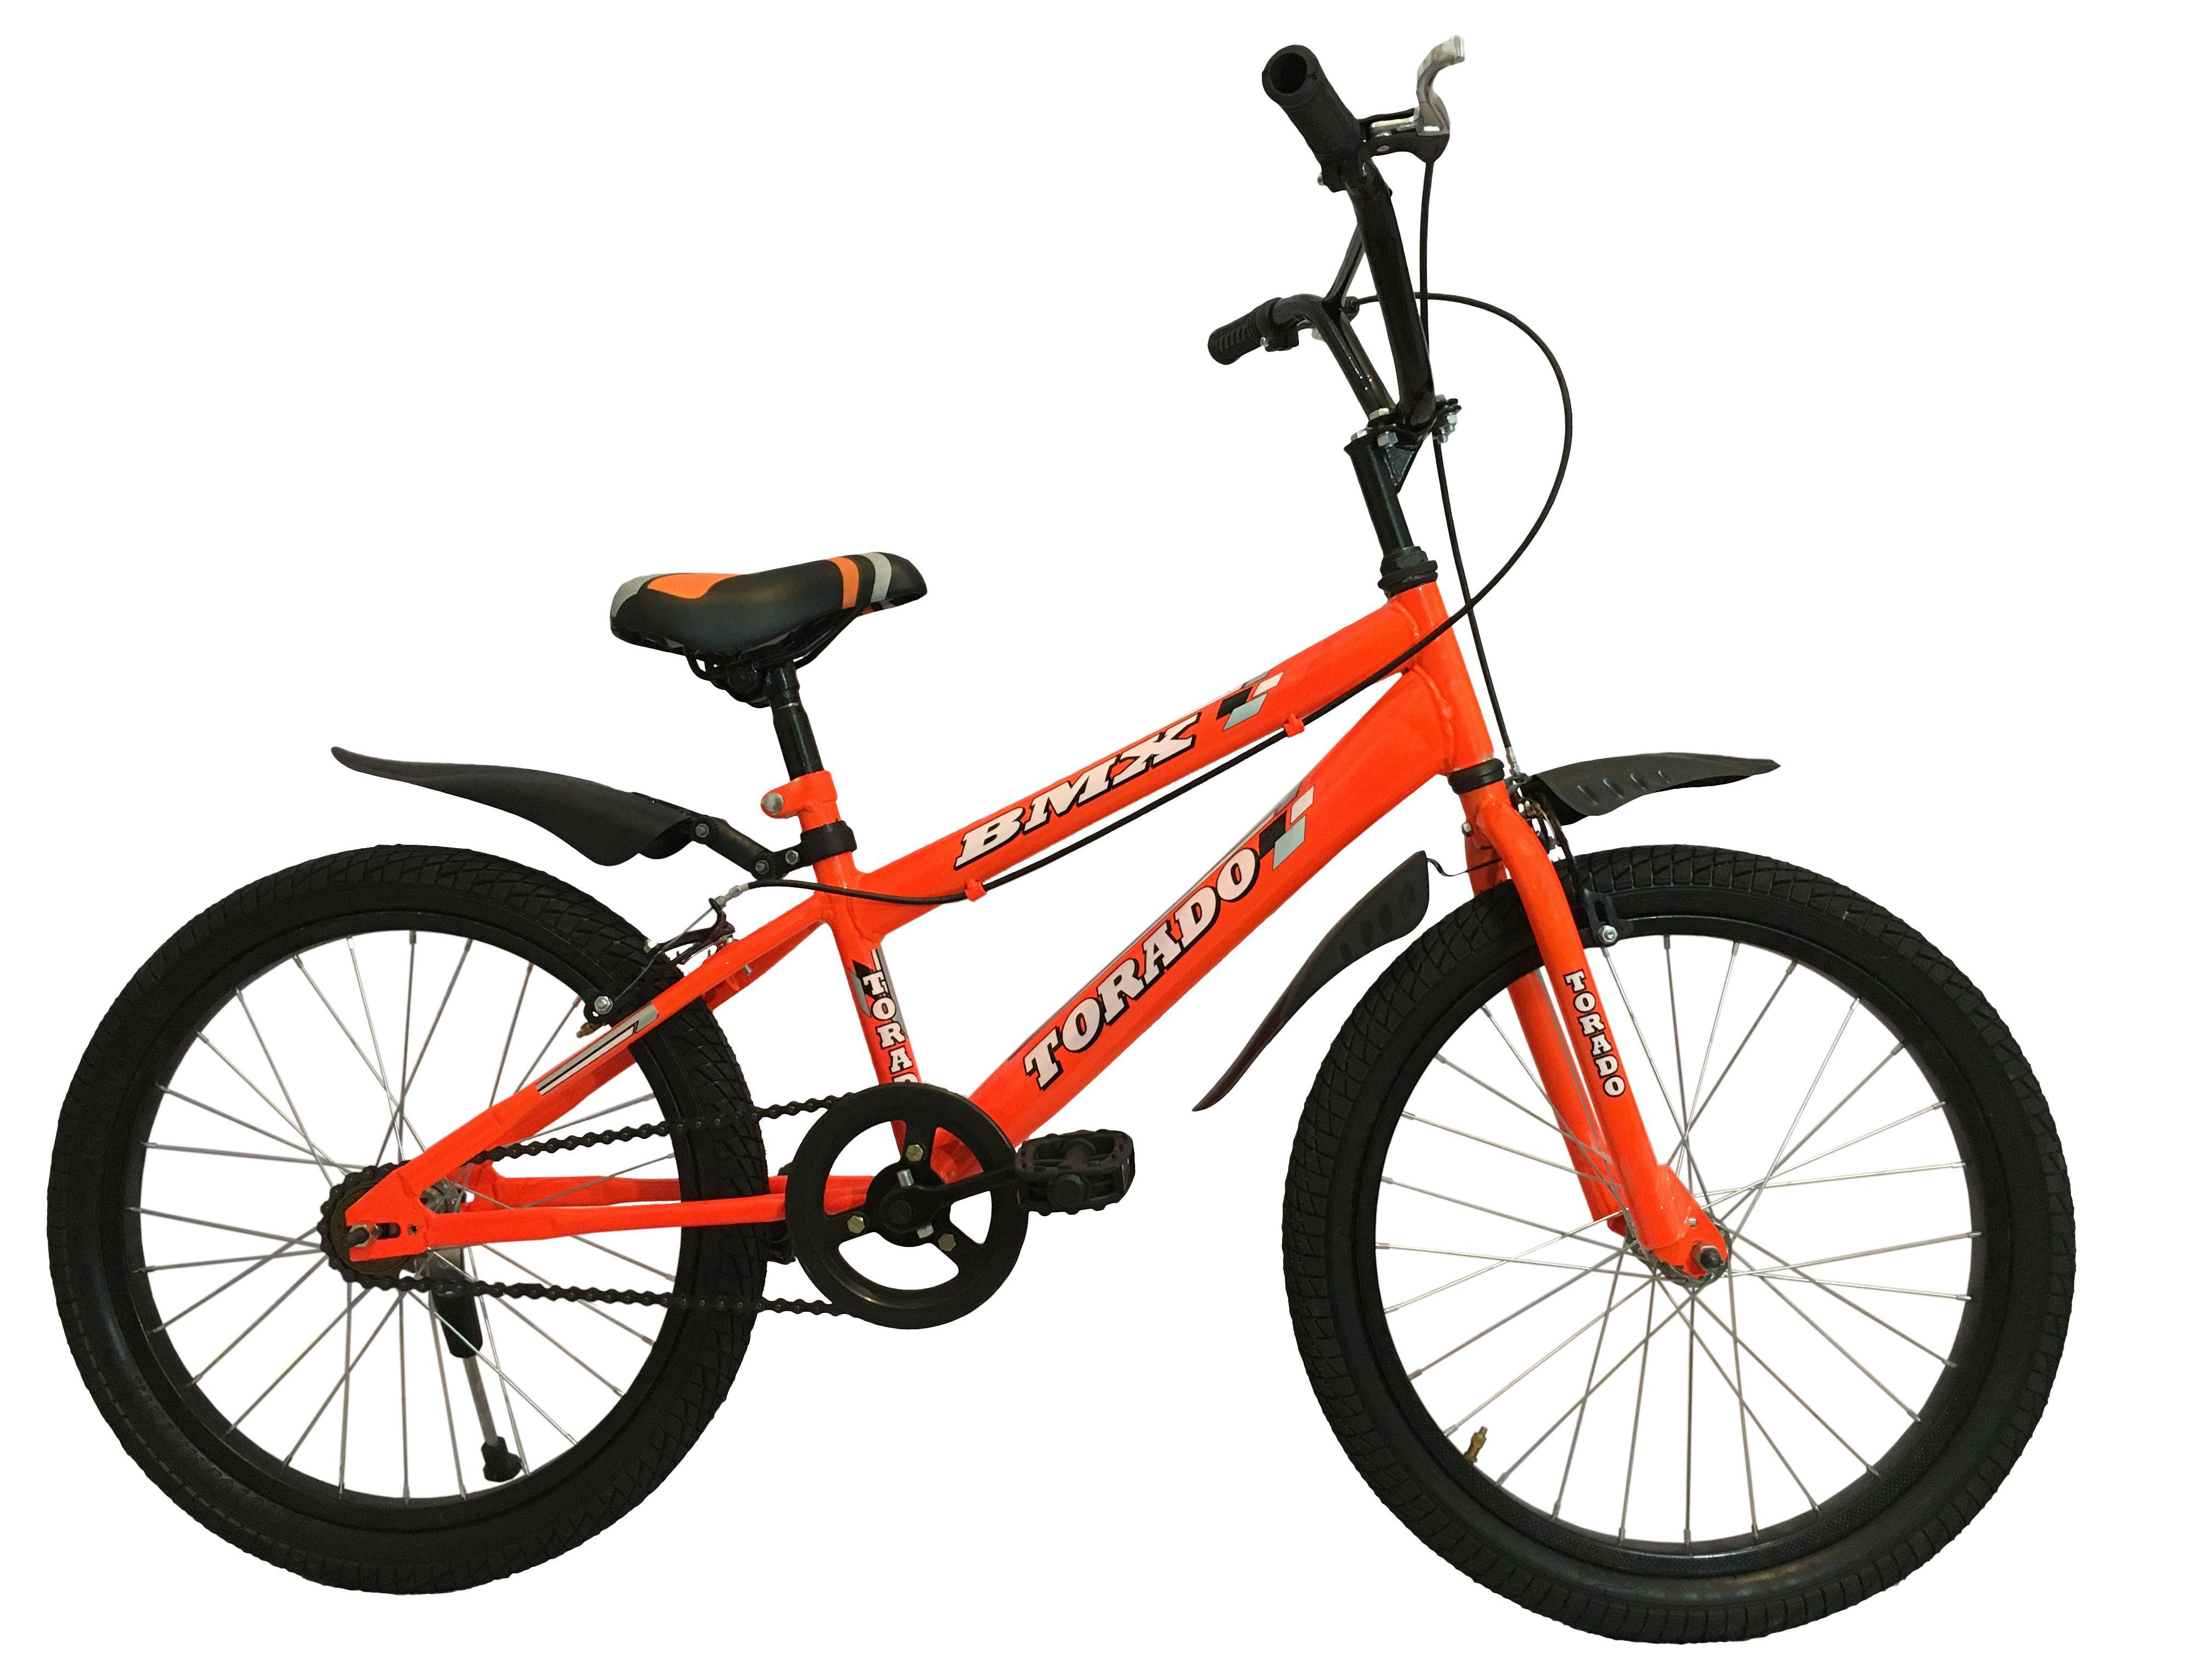 Torado bmx 20 tt Orange 50.8 cm(20) Comfort bike Bicycle: Buy Online ...